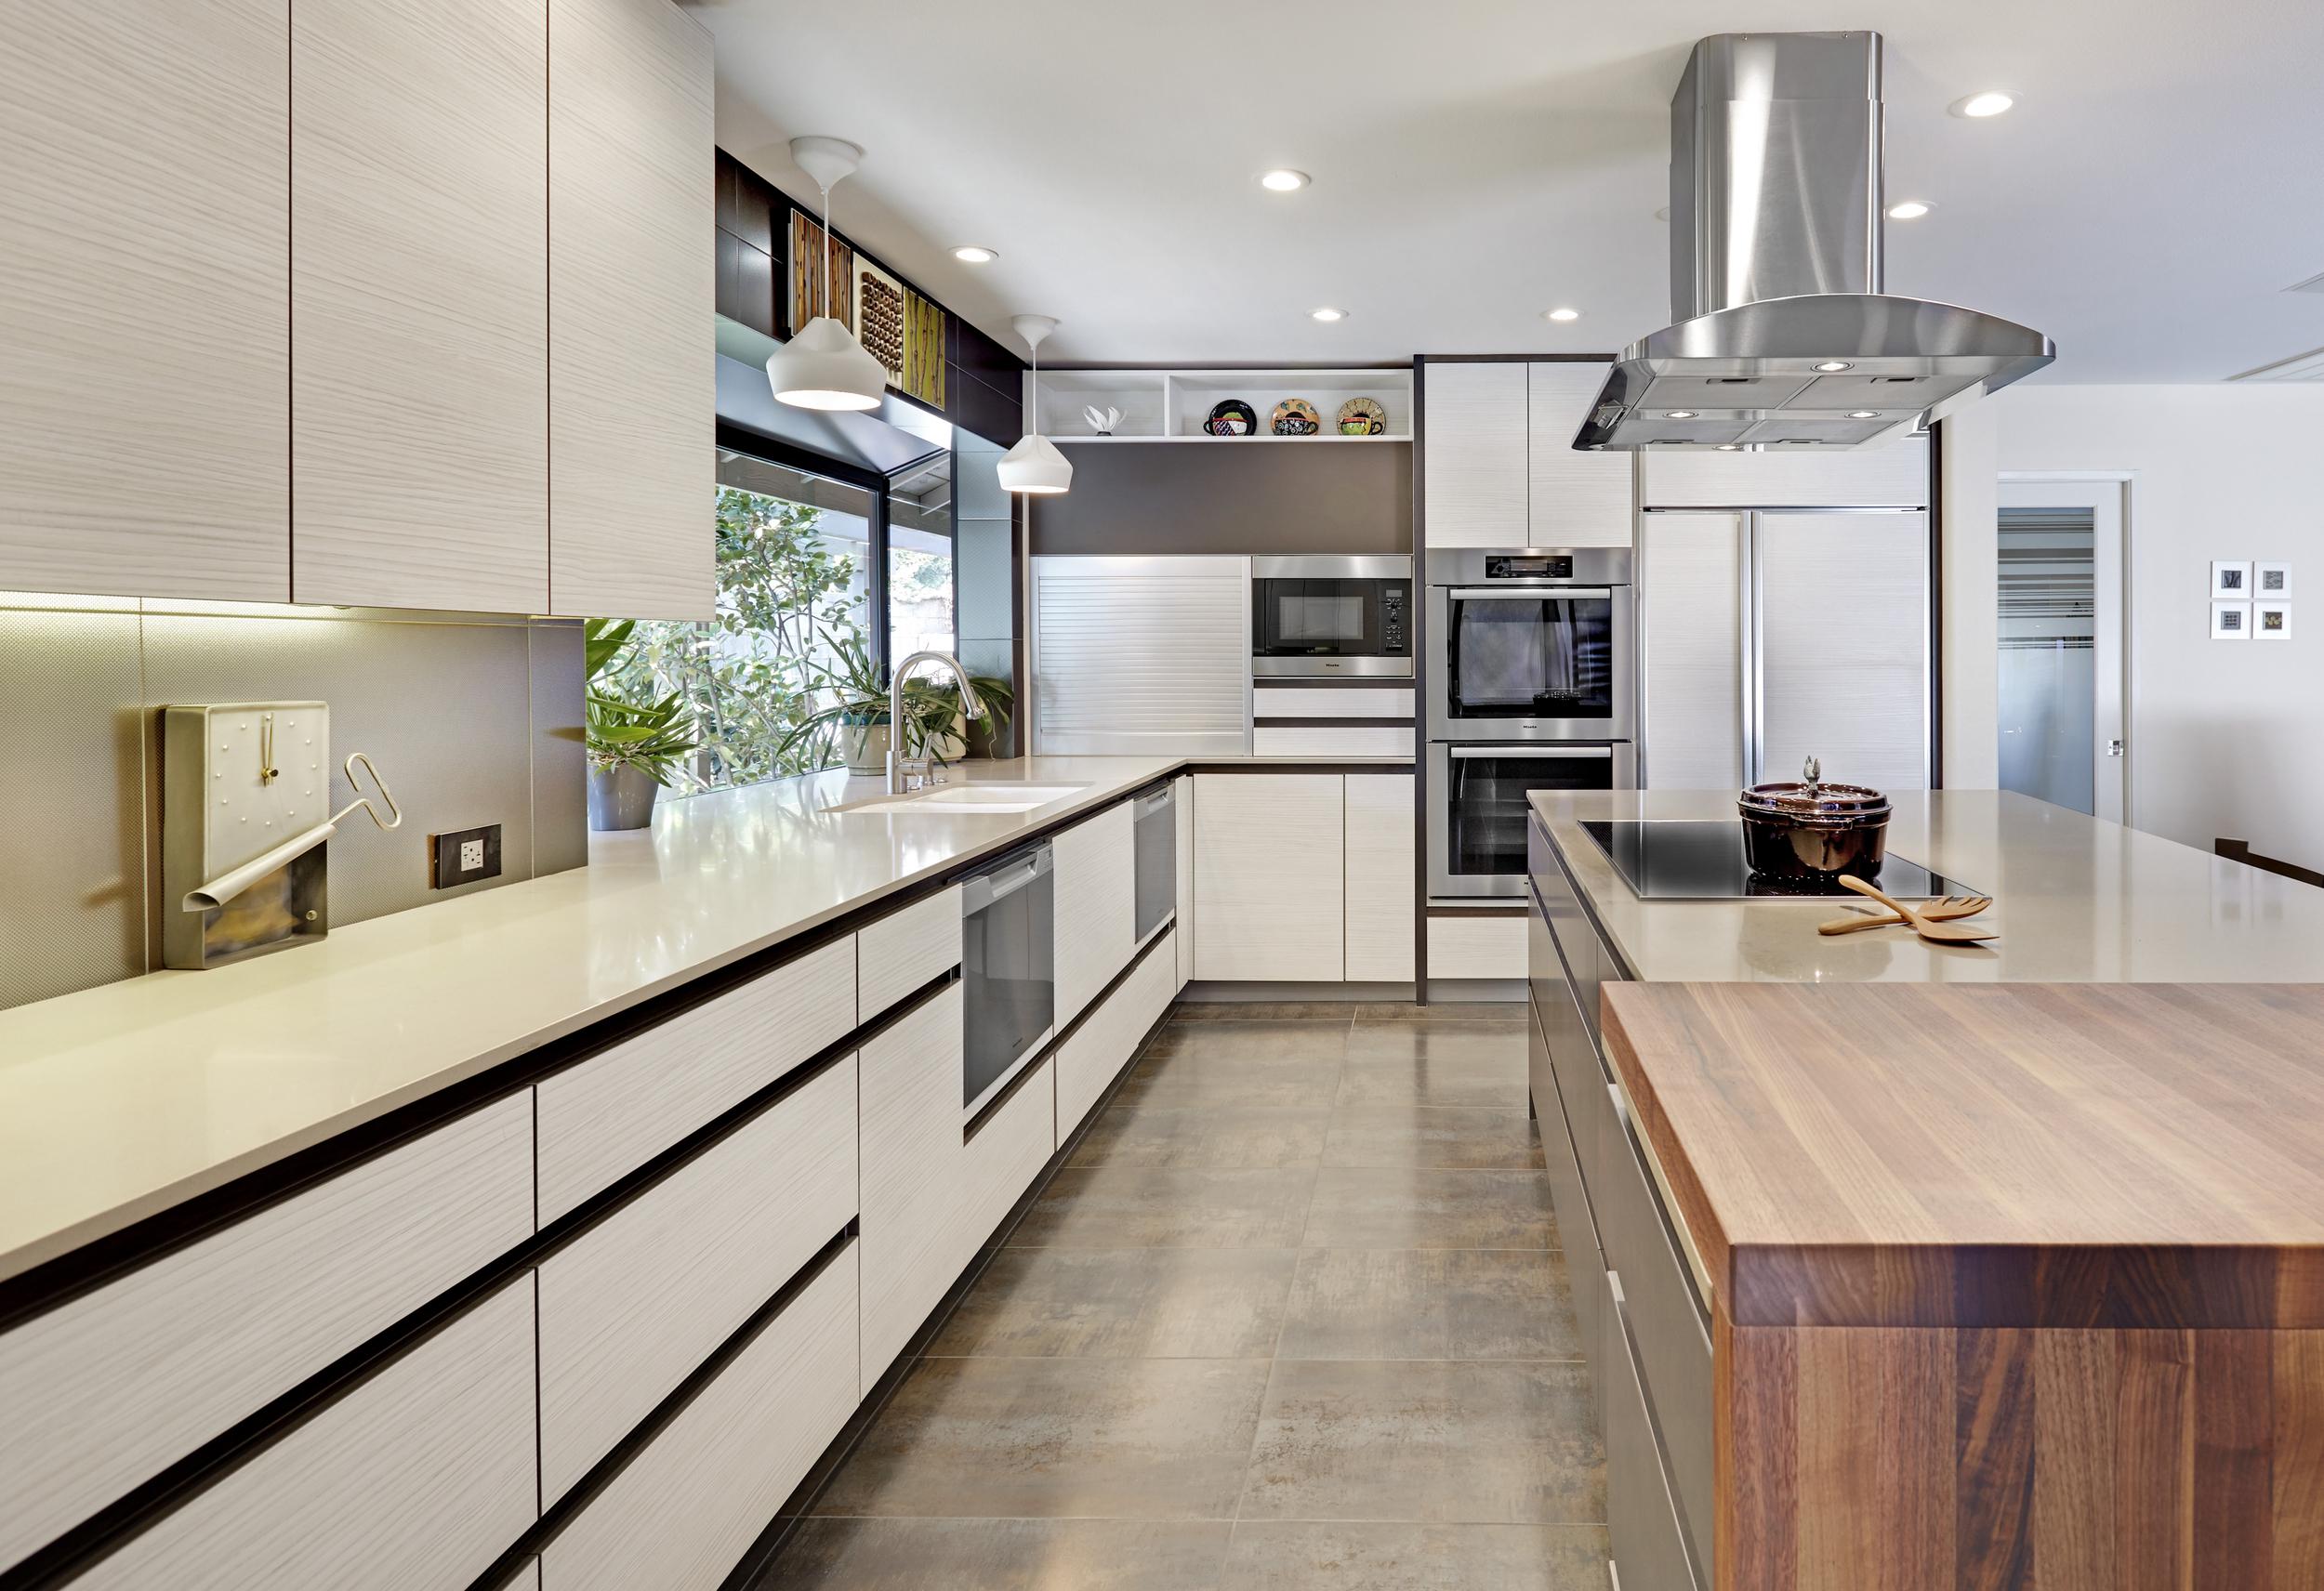 kitchen showrooms sacramento faucet repair kit nar design groupwww narfinecarpentry com fine carpentry cabinetrykit